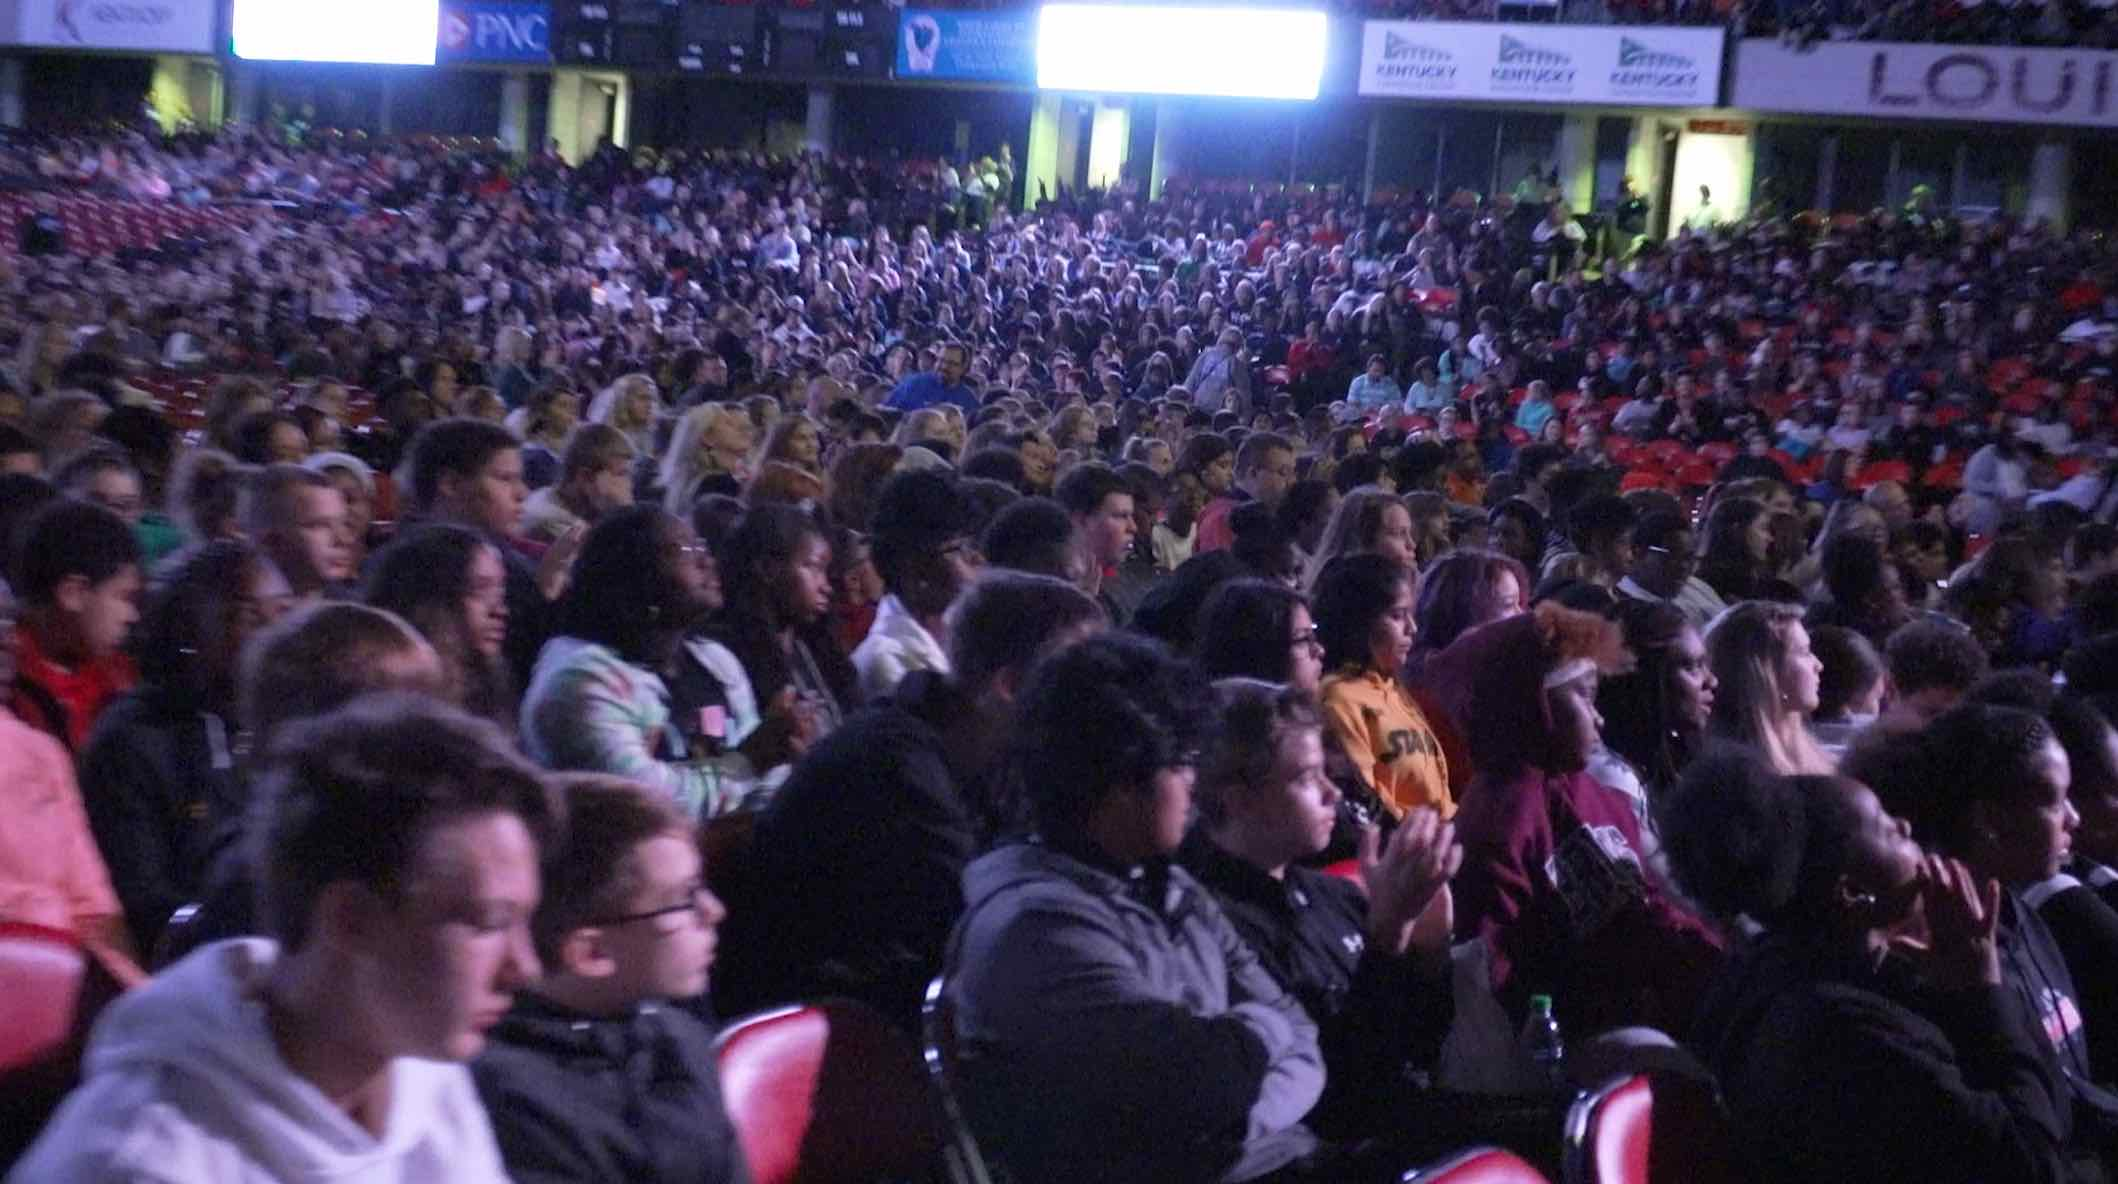 Crowd 5.jpeg